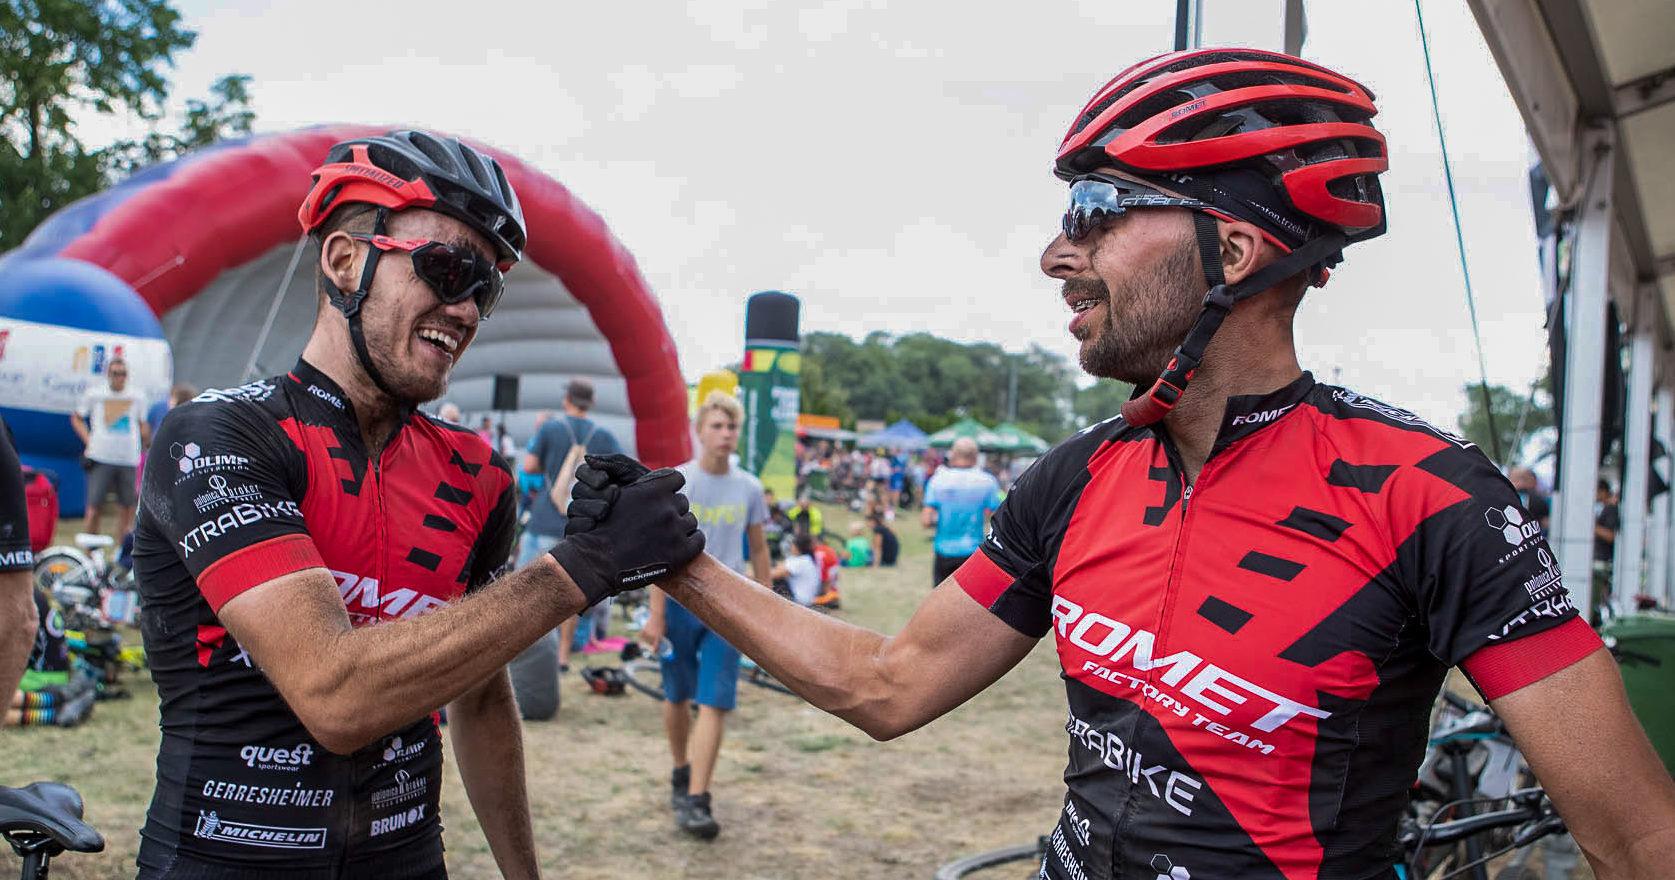 Romet Factory Team podsumowuje pełen sukcesów sezon 2019